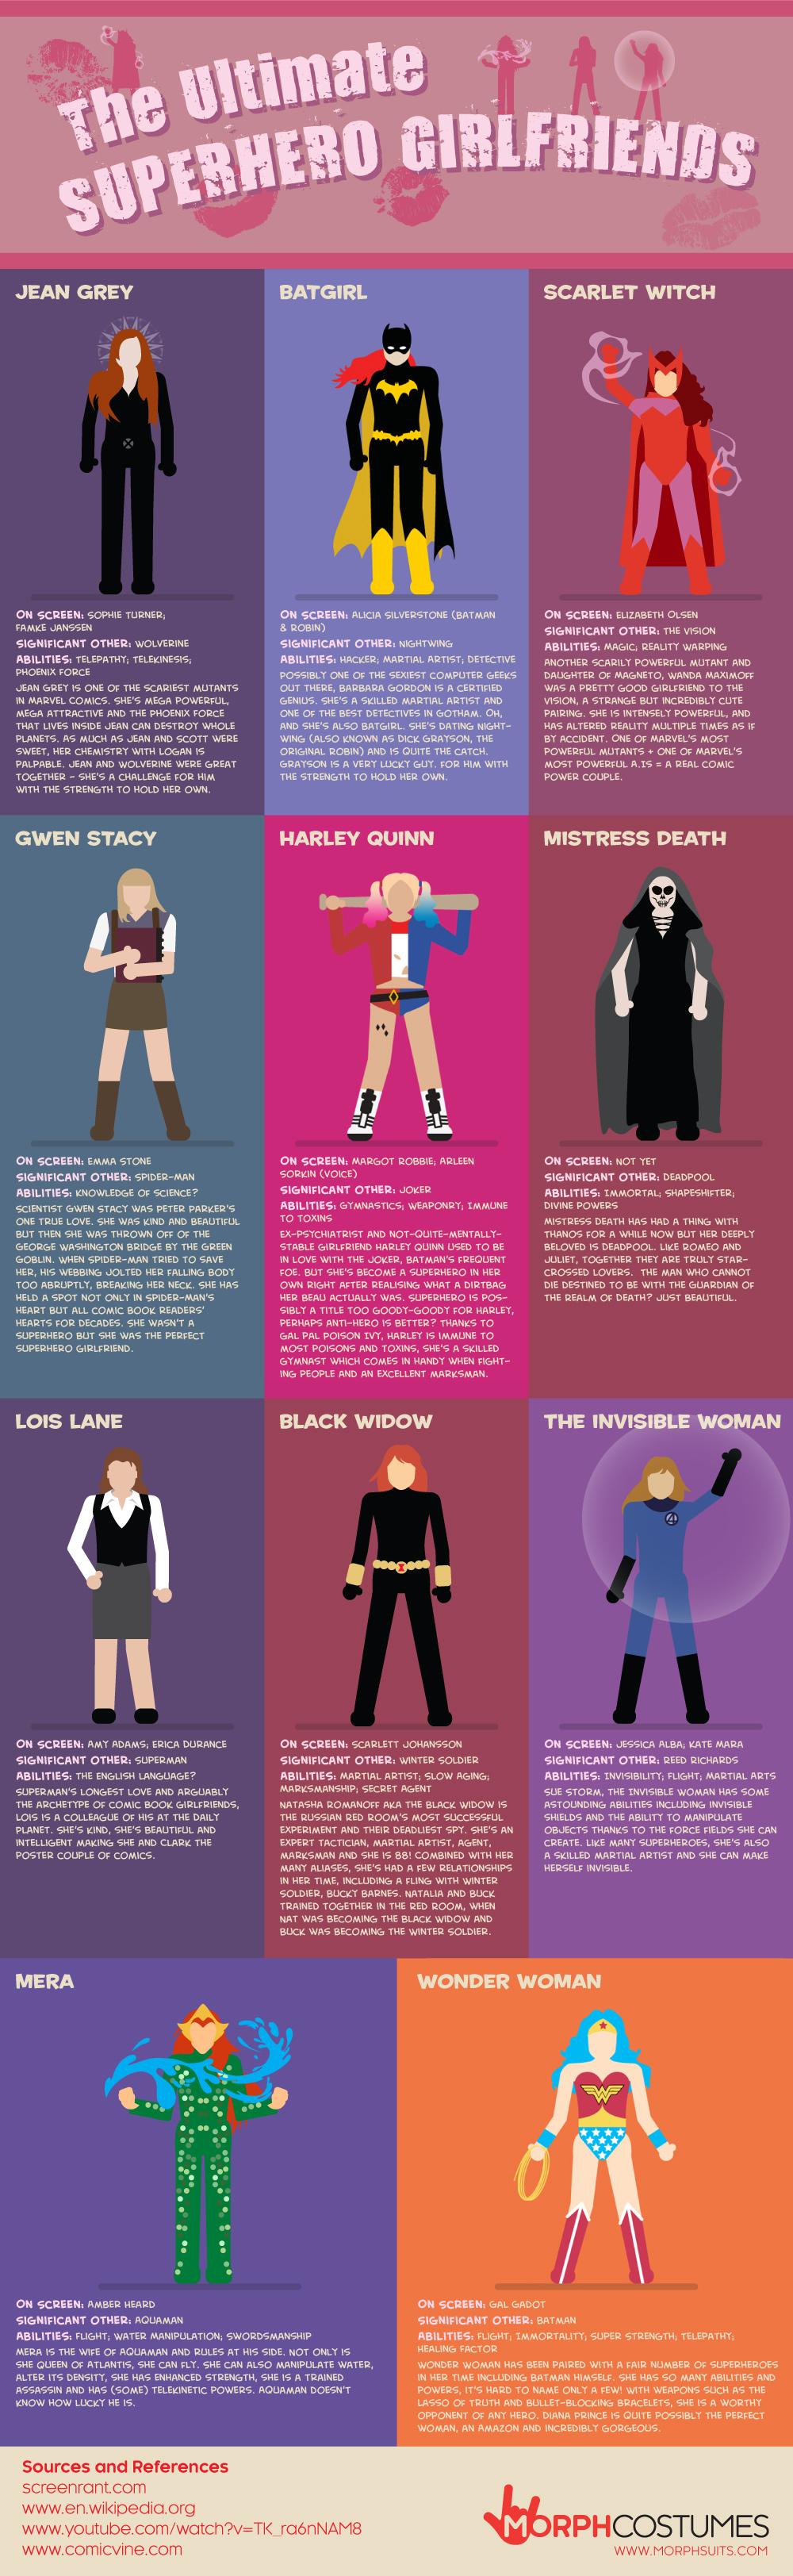 The Best Superhero Girlfriends